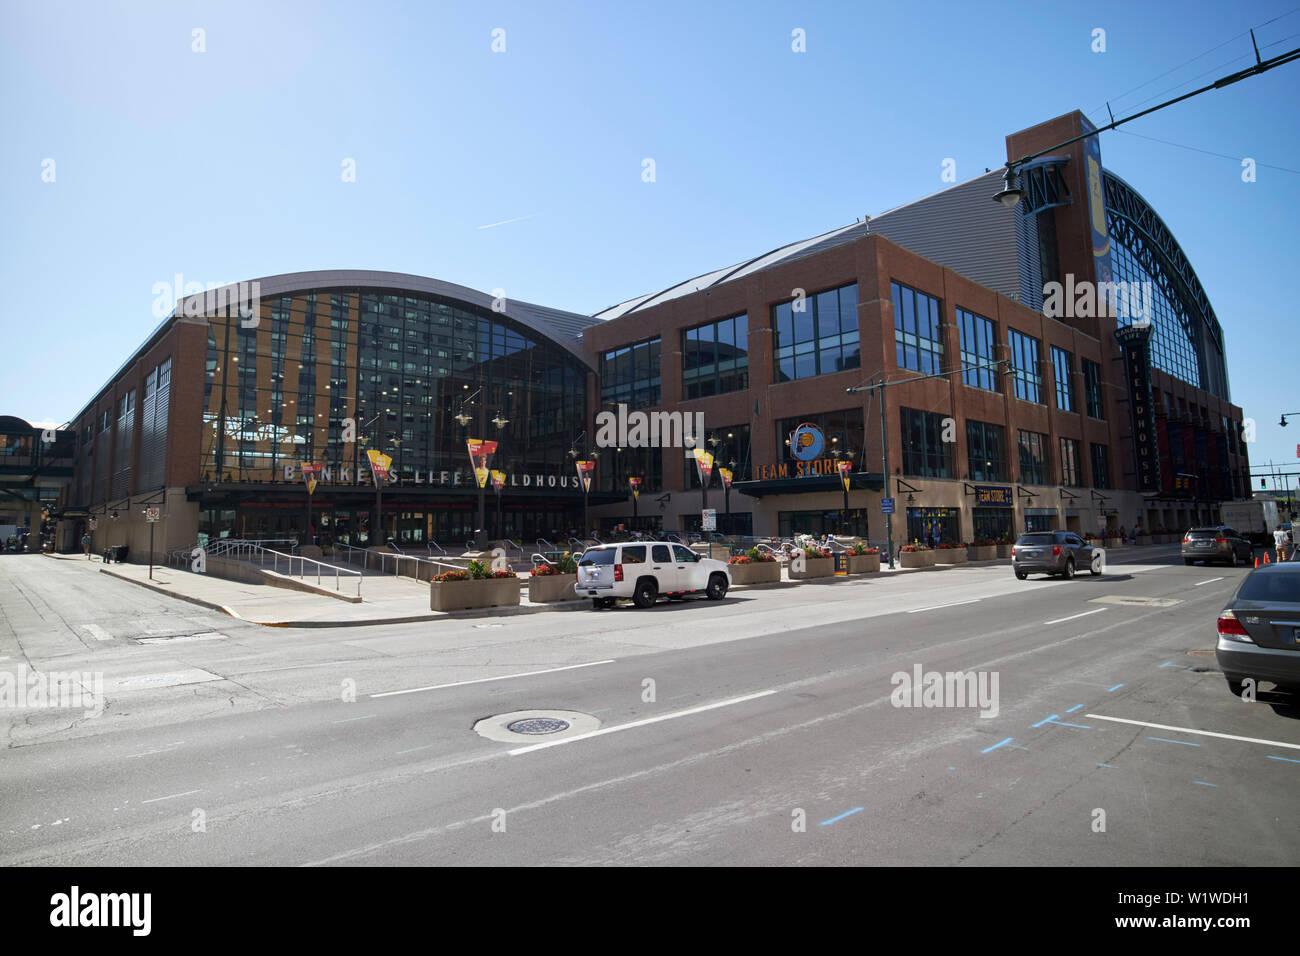 bankers life fieldhouse stadium Indianapolis Indiana USA - Stock Image